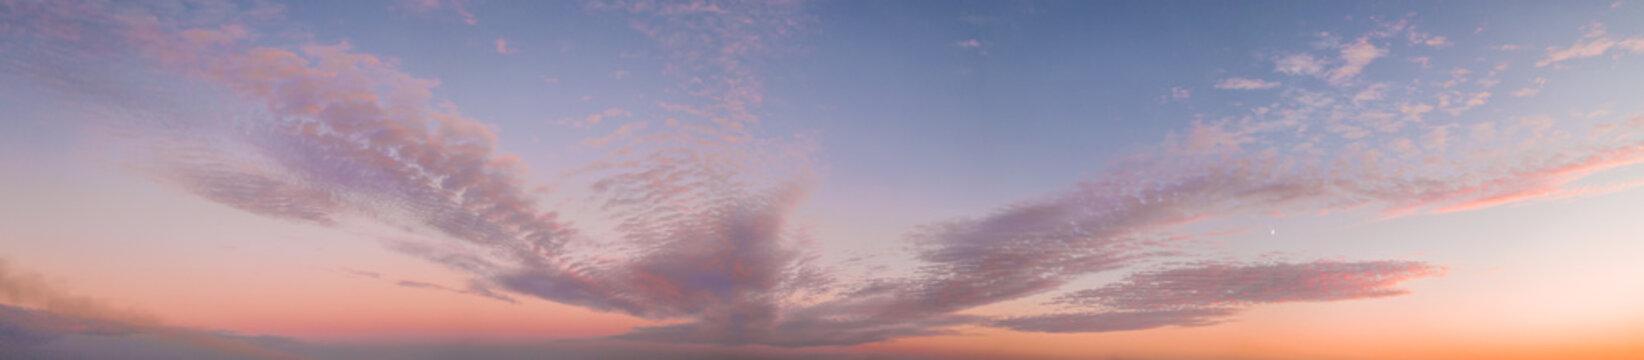 Colorful purple sunset twilight evening sky. High-resolution stitch panorama image.